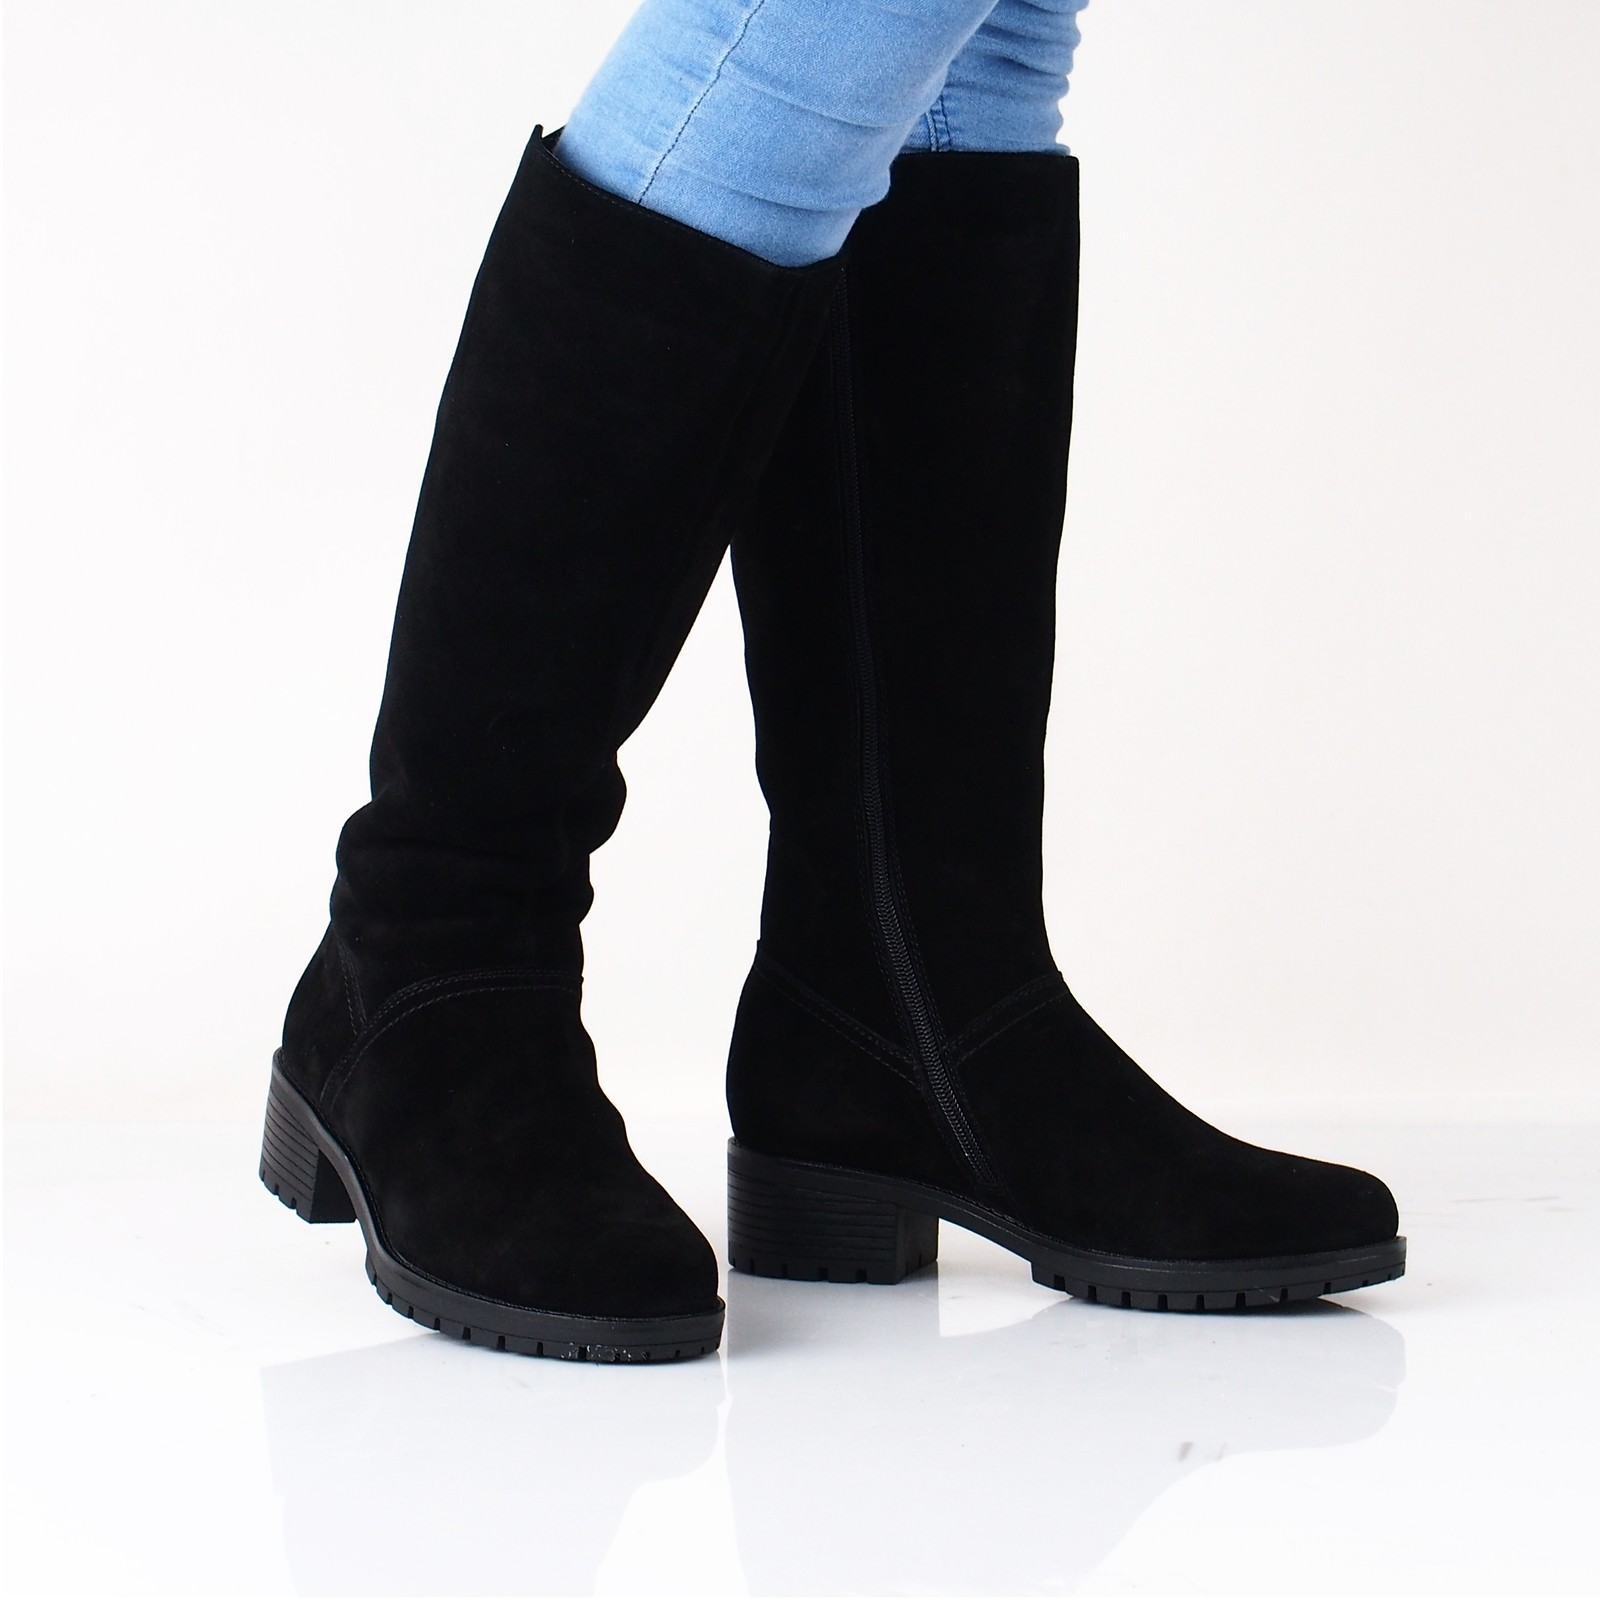 2b727ec1dd69 Rieker dámske semišové čižmy na zips - čierne ...